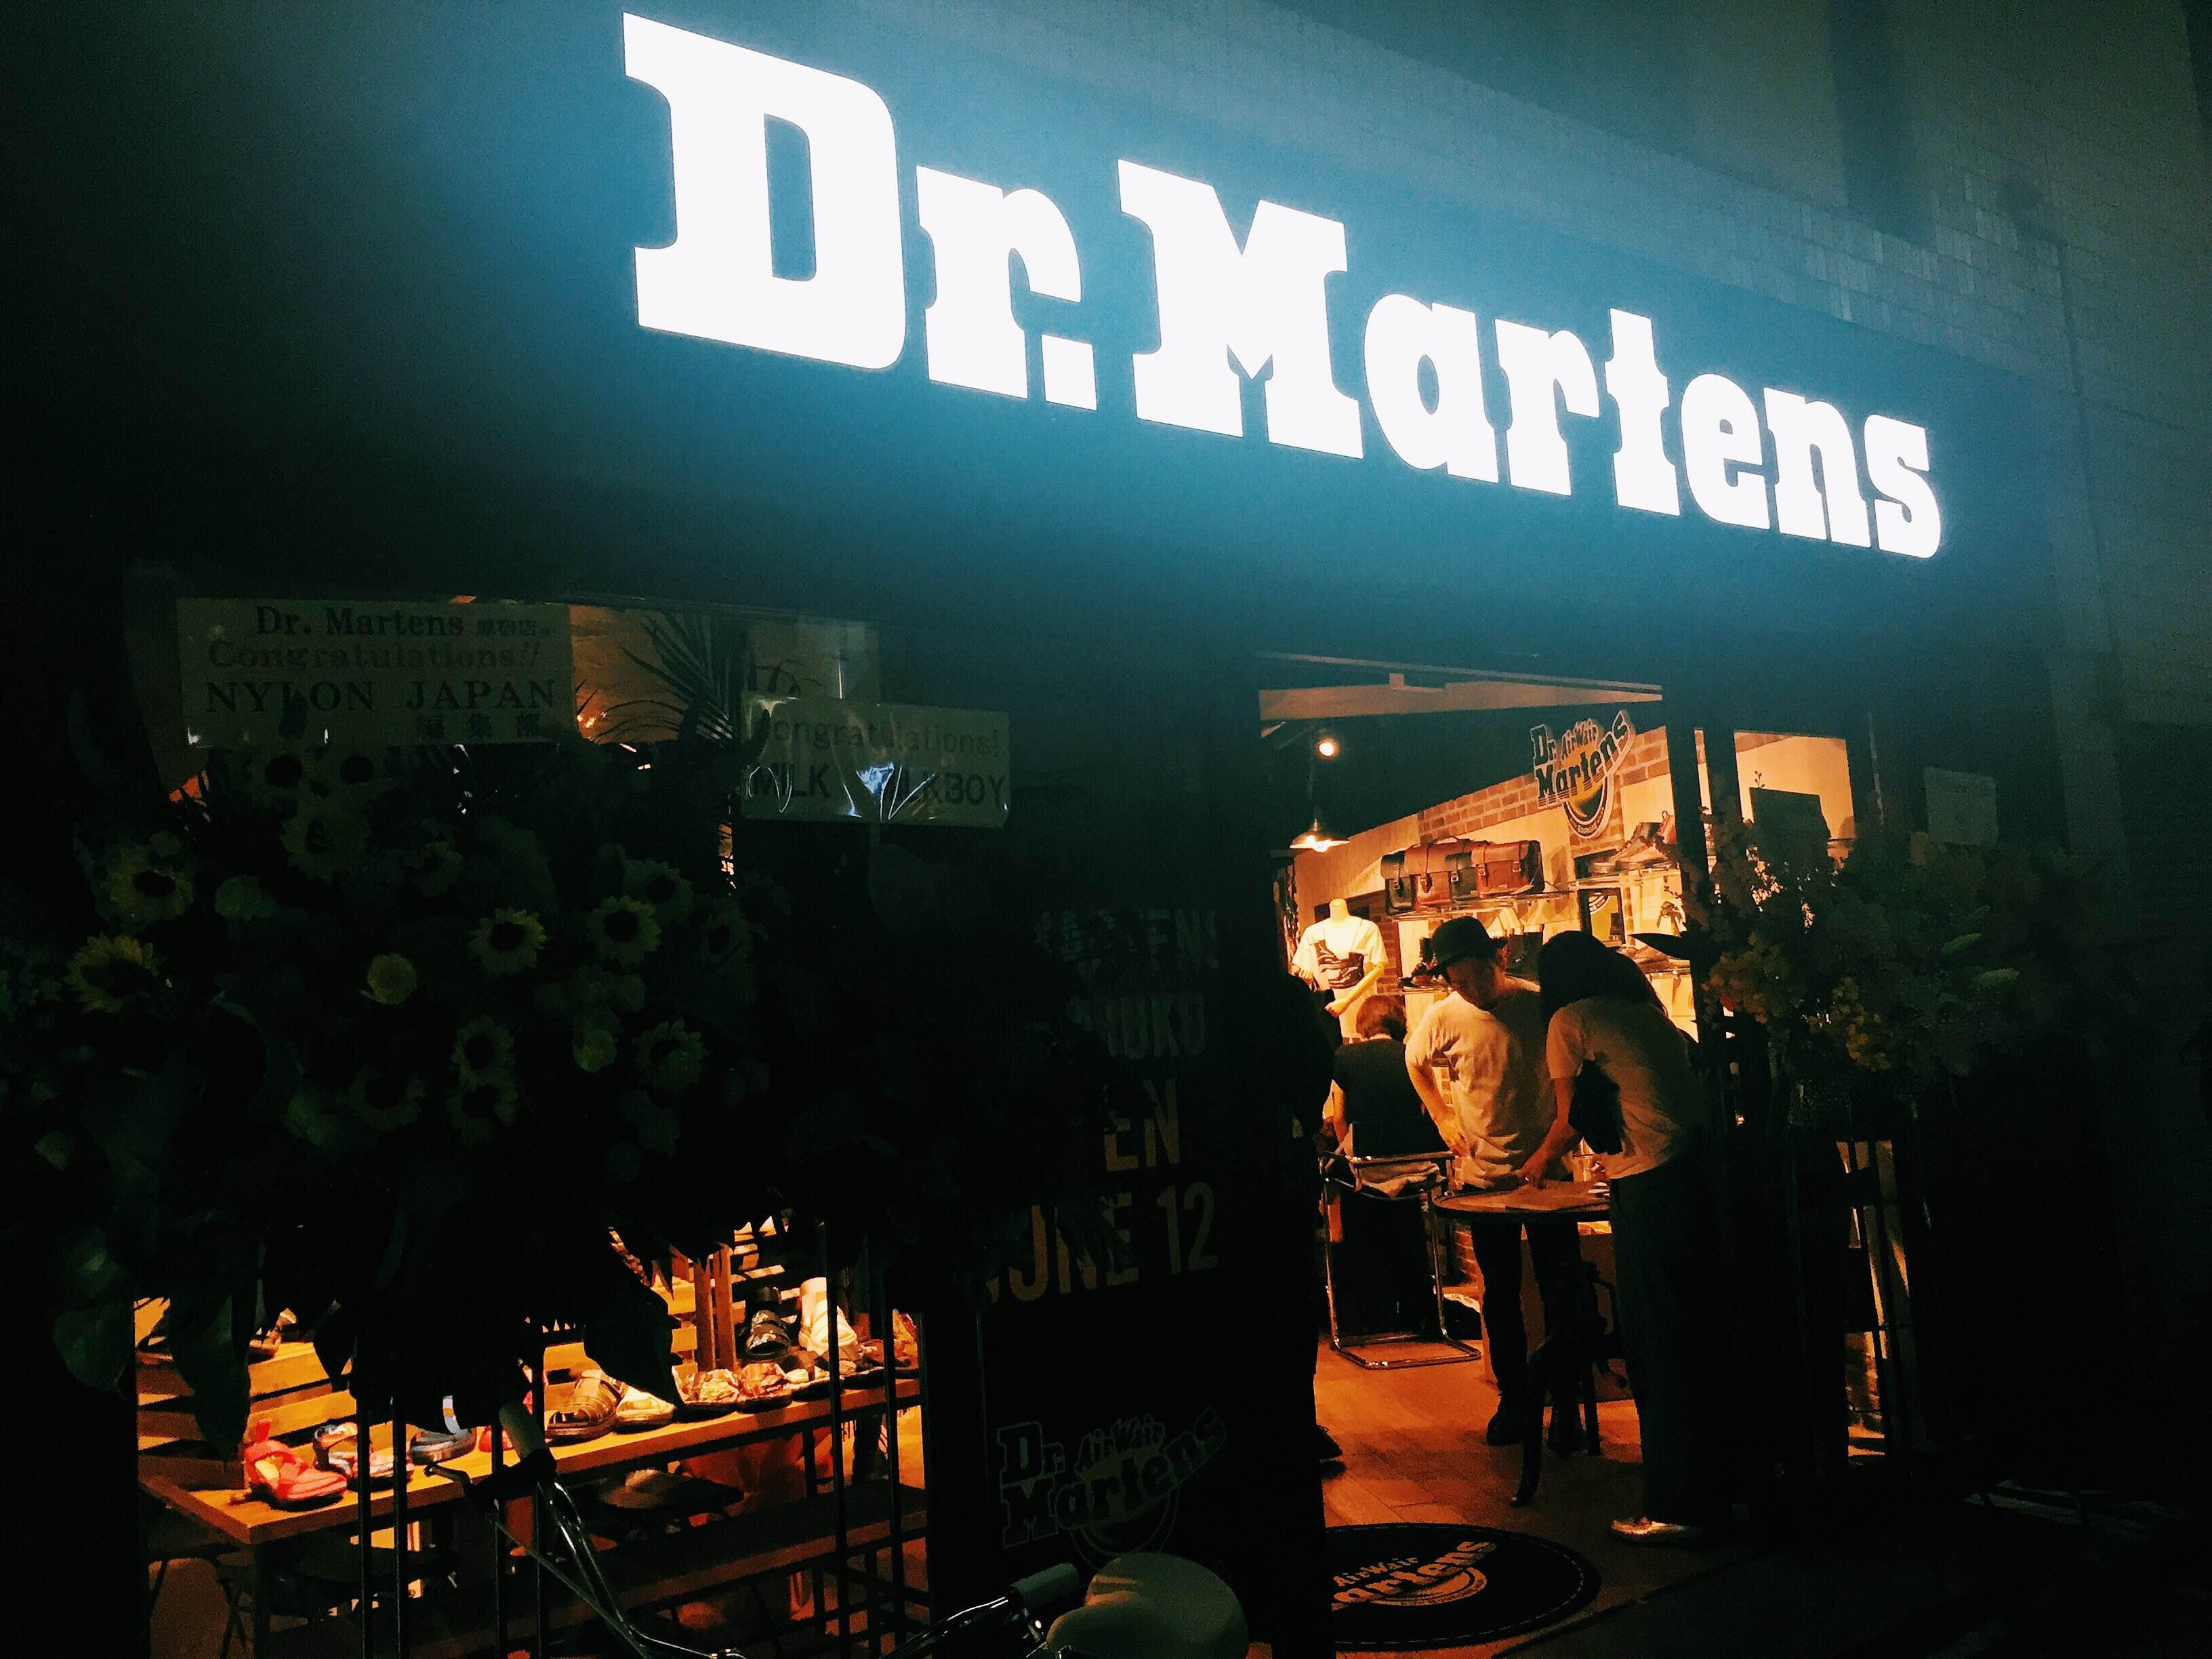 Dr.Martensの路面店が原宿にオープン!!オープニングパーティーと新店舗の様子をレポート。